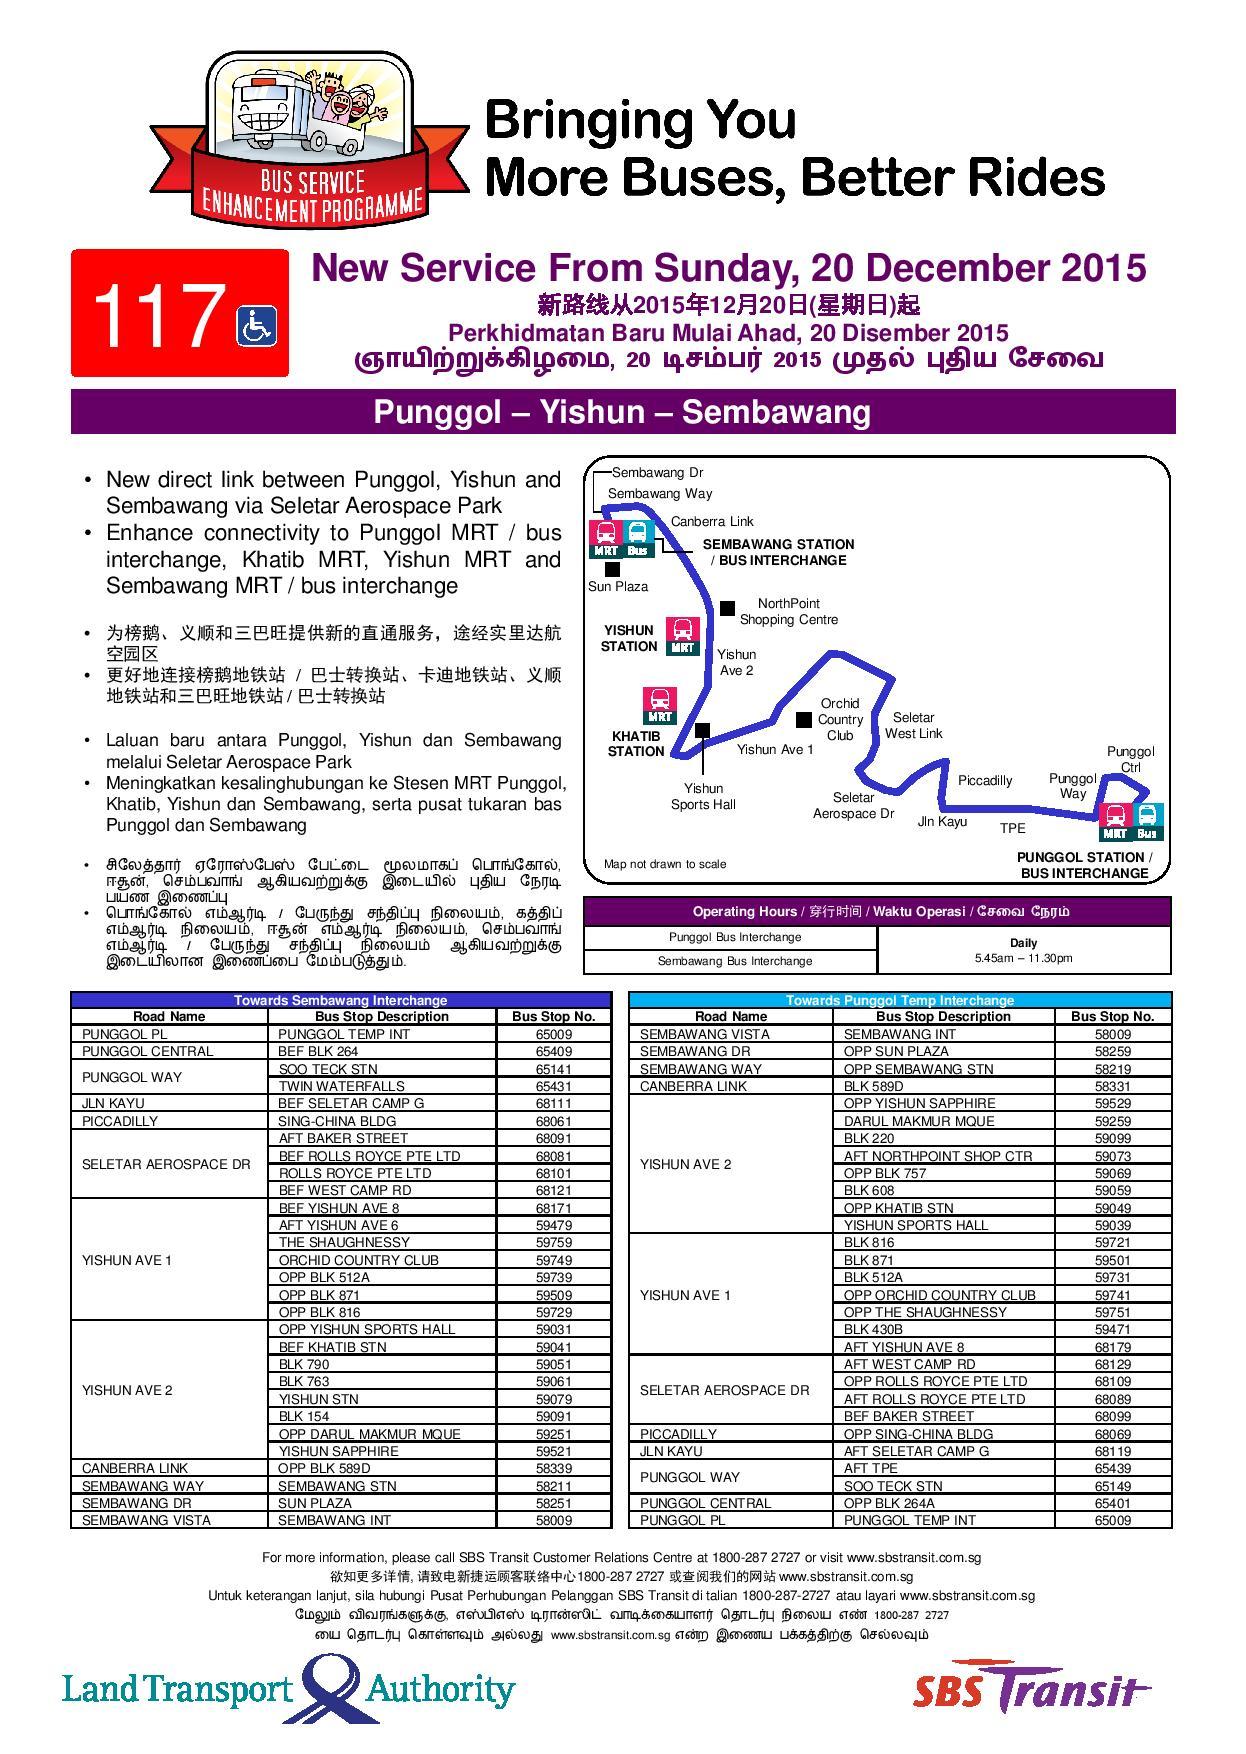 sbs transit service 117 | public transport sg